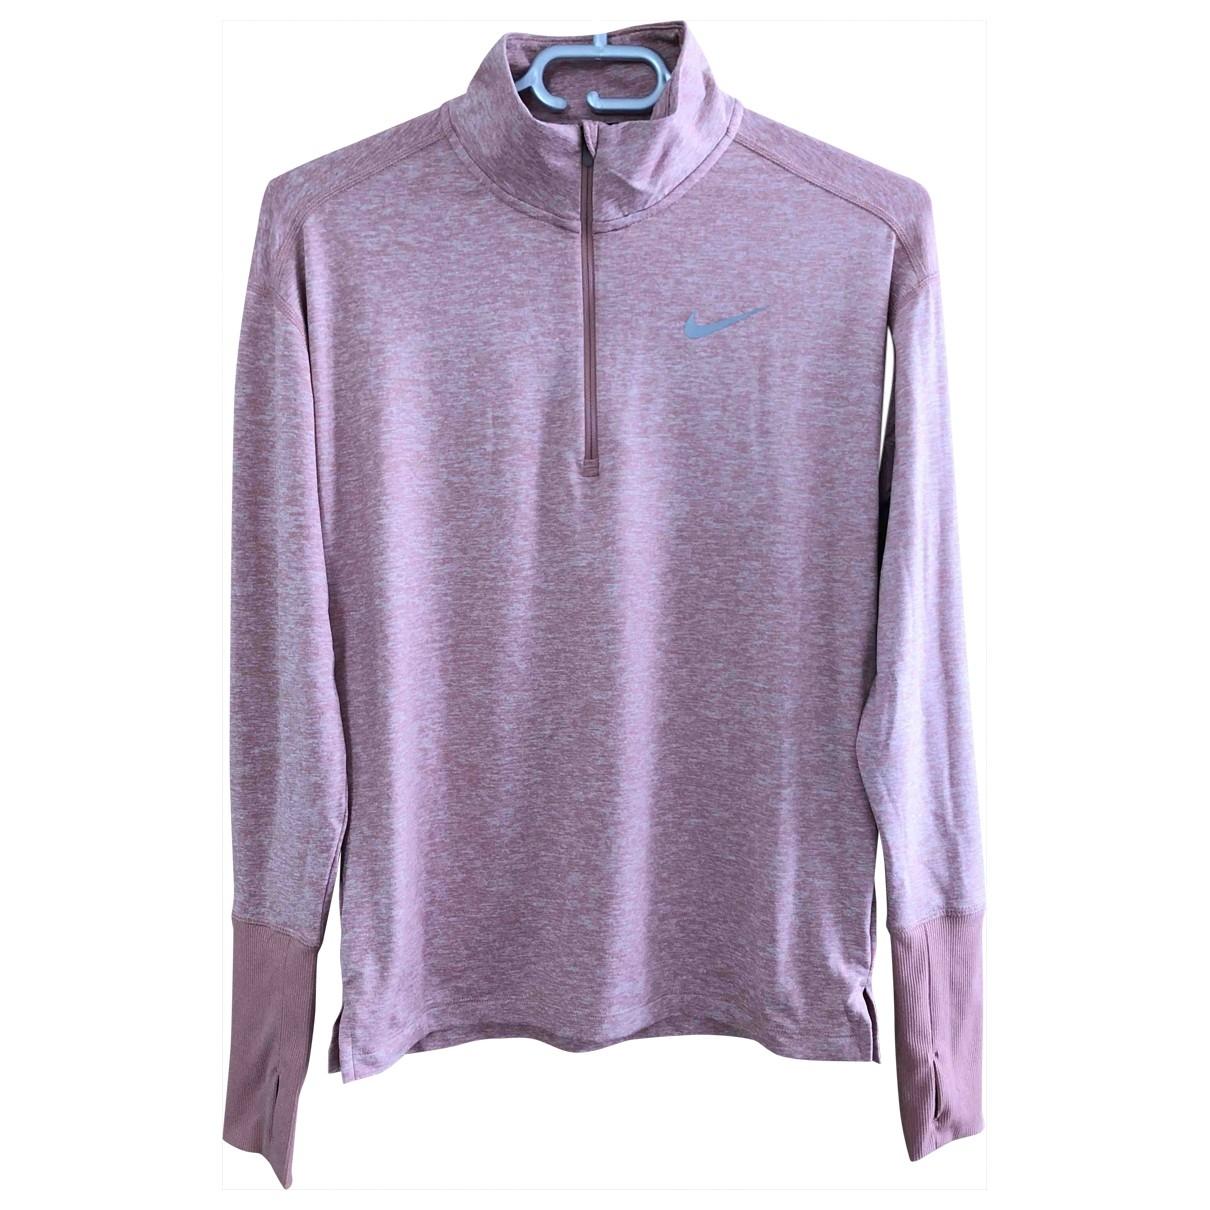 Nike \N Pink  top for Women XS International